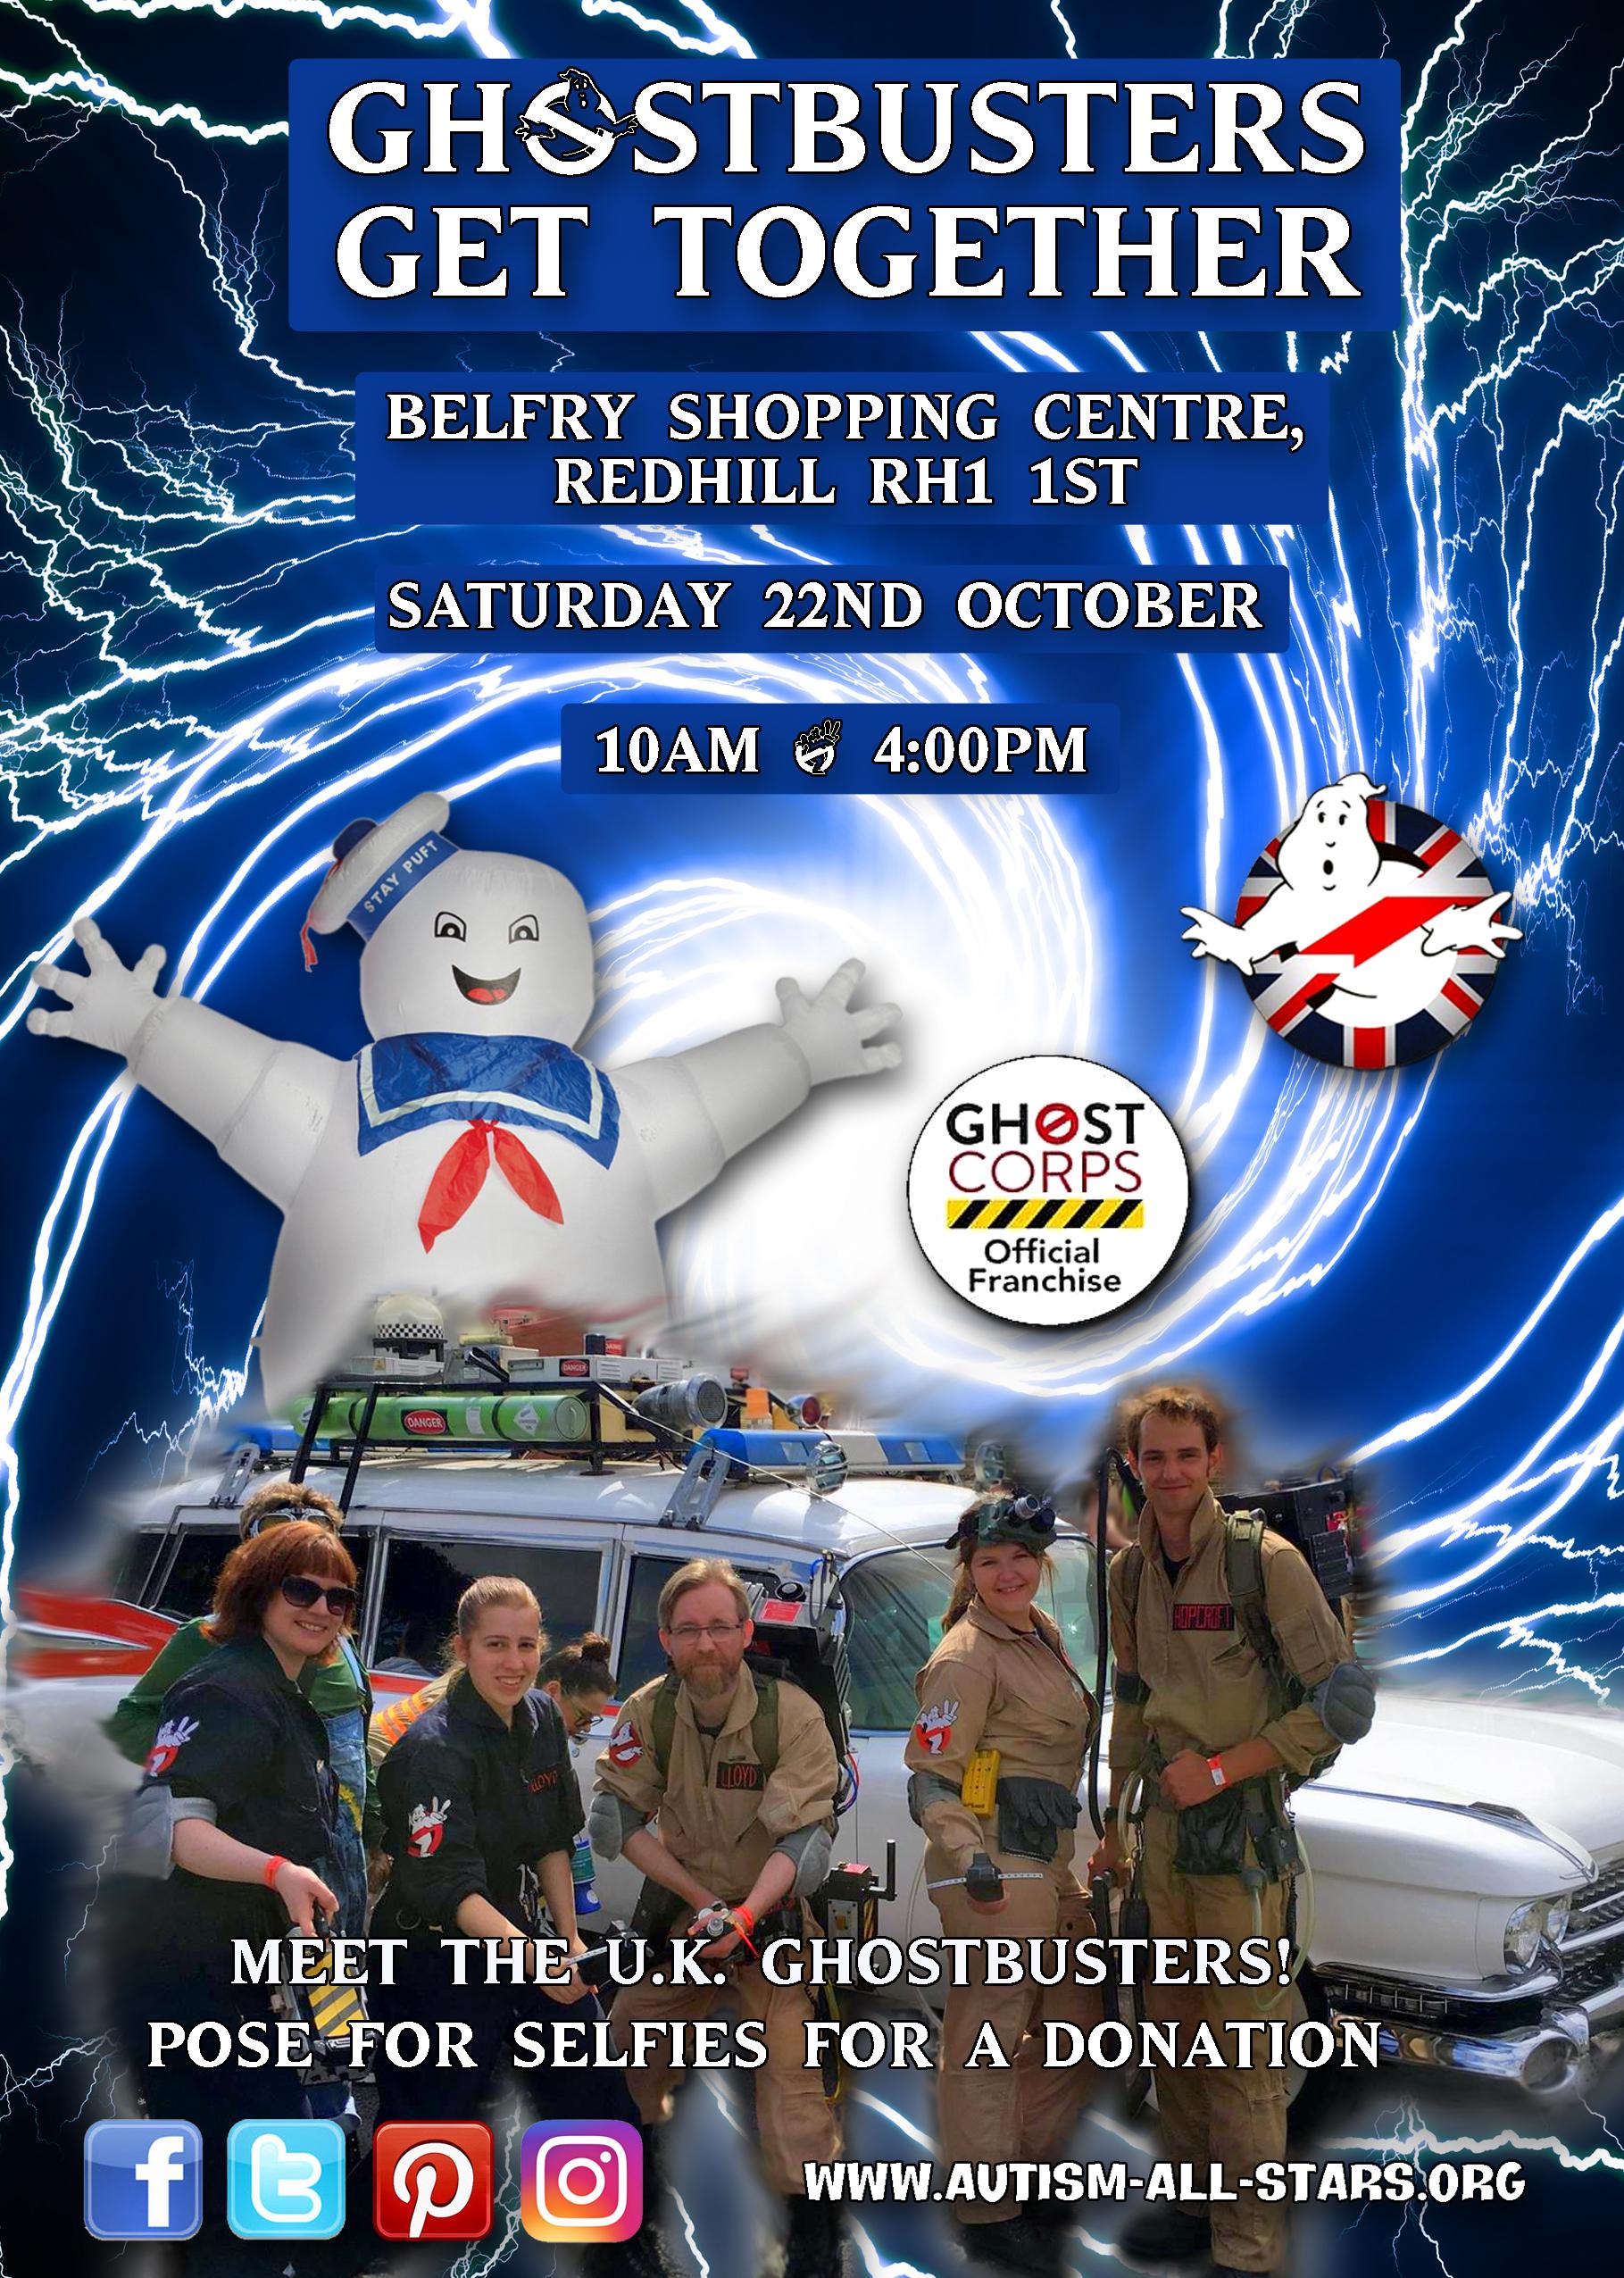 ghostbusters-flyer